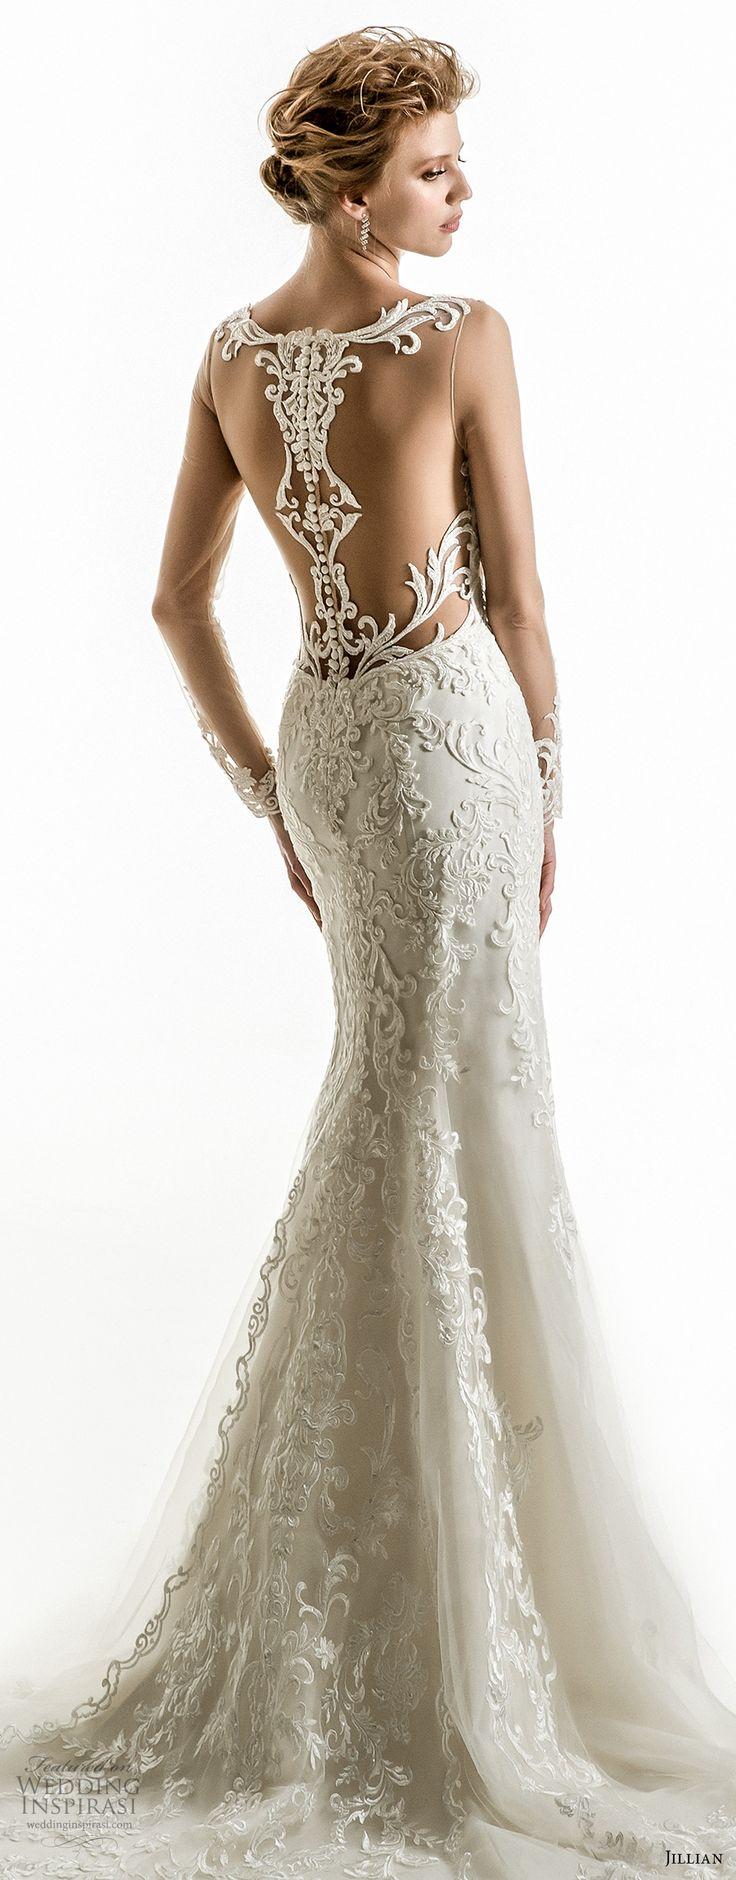 jillian 2018 bridal long sleeves illusion bateau sweetheart neckline full embellishment elegant fit and flare wedding dress sheer lace back chapel train (05) zv bv